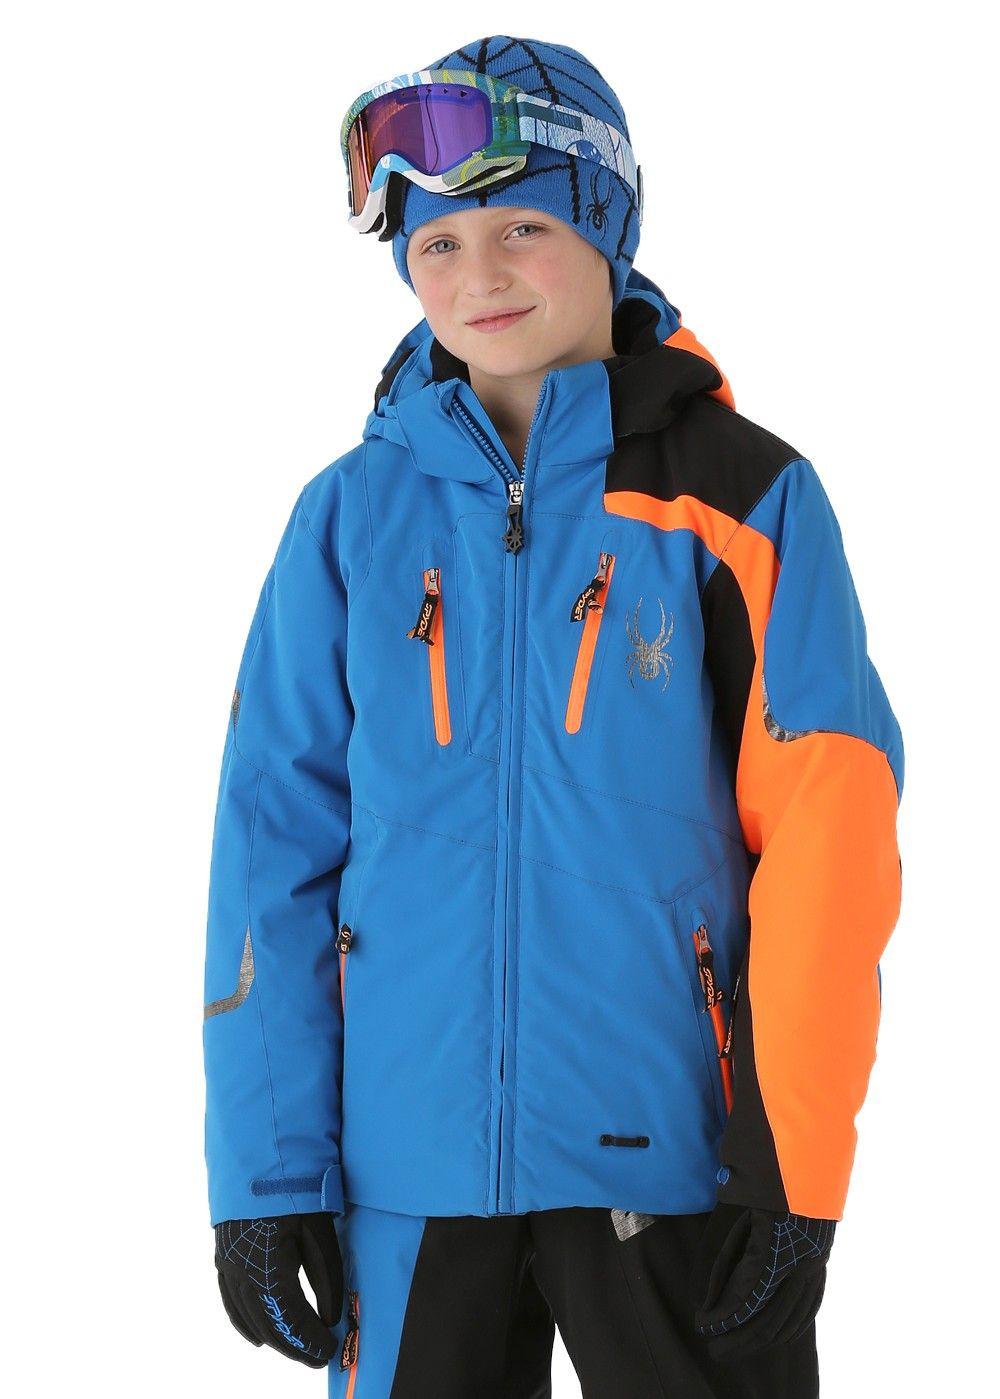 Spyder Boys Avenger Jacket Collegiate Black Neon Orange Broncos Colors At Winterkids Com Boys Jacket Stylish Winter Jacket Boys Coat [ 1399 x 1000 Pixel ]